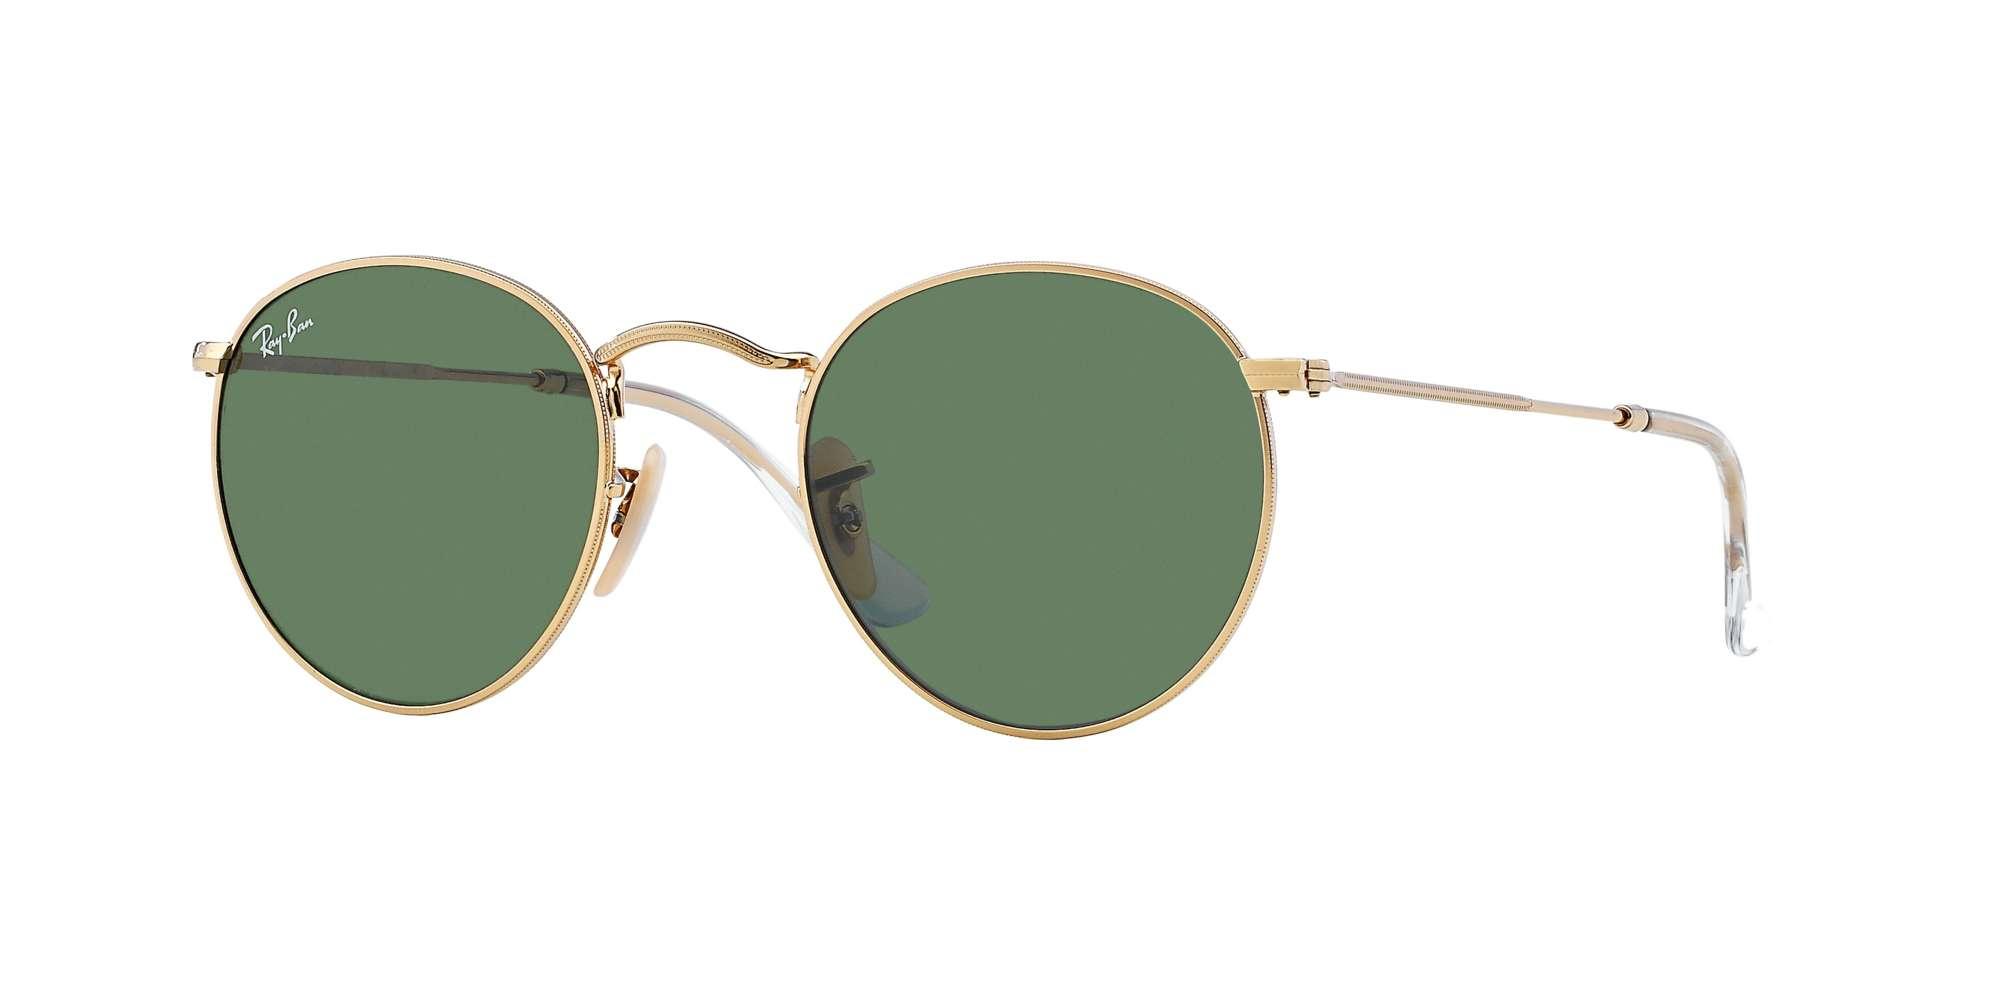 ARISTA / CRYSTAL GREEN lenses